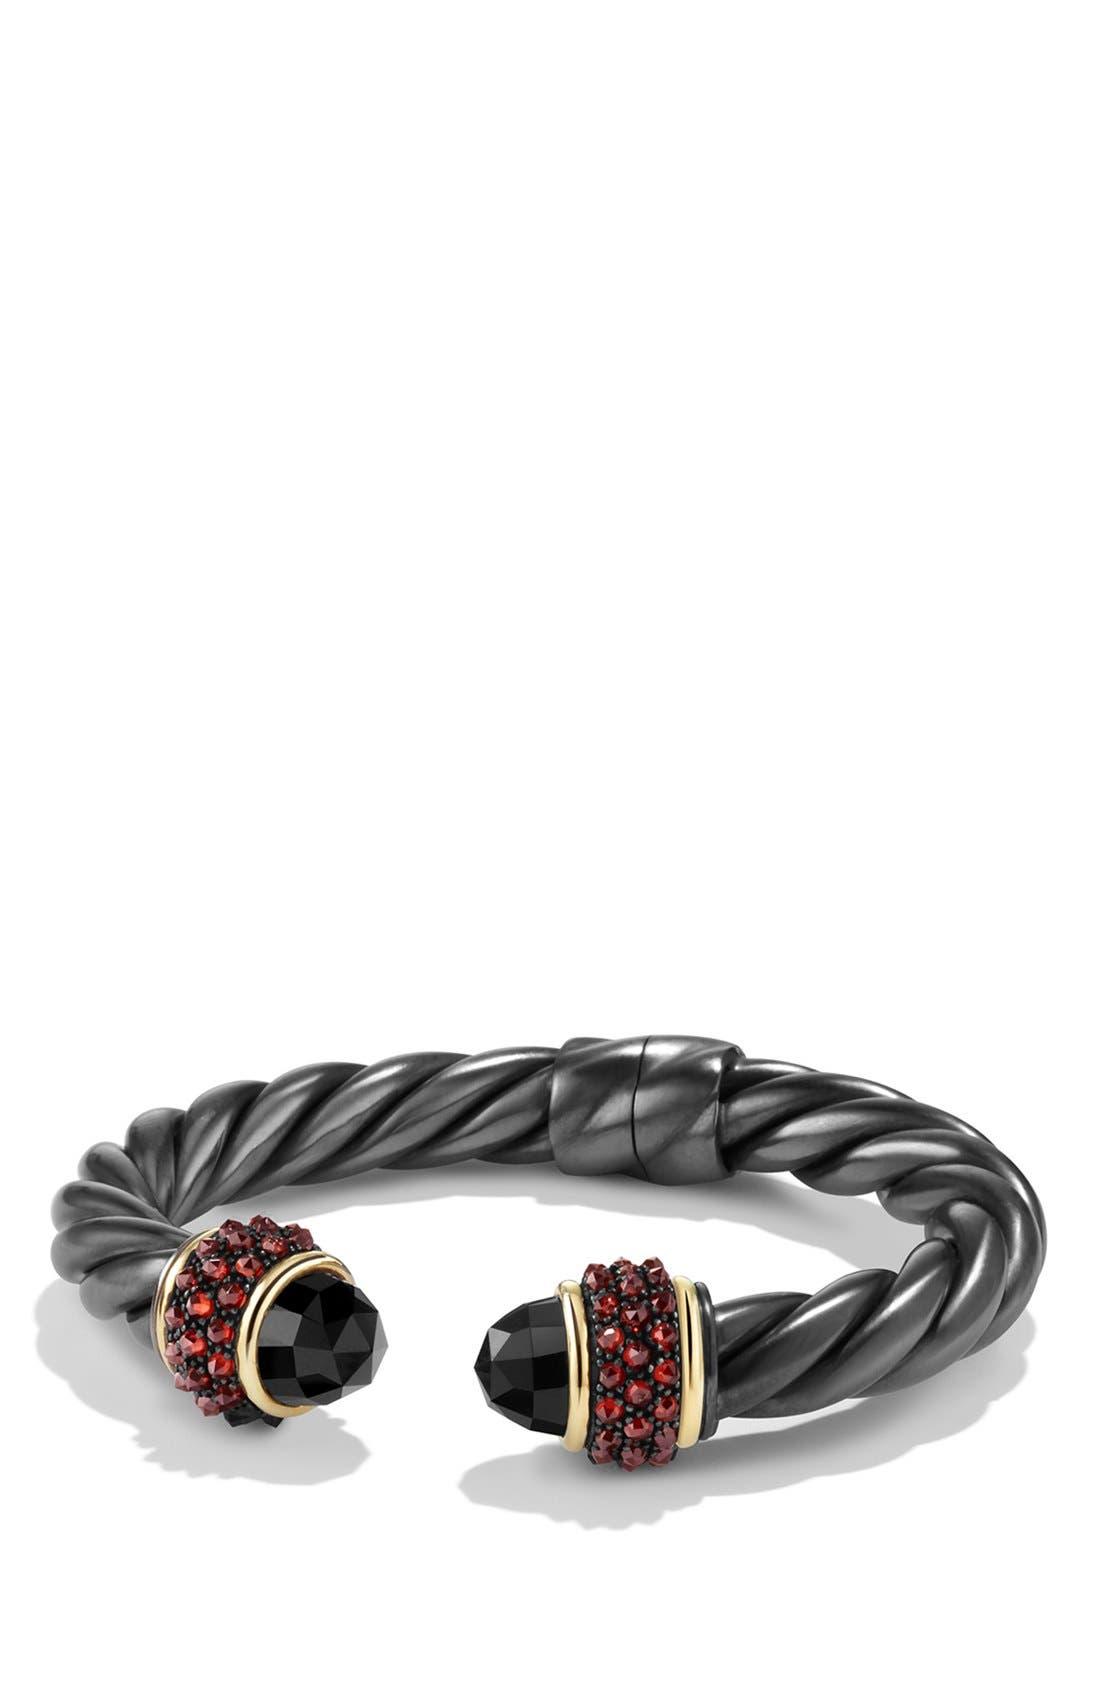 'Osetra' Bracelet with Black Onyx, Garnet and 18K Gold, Main, color, 001